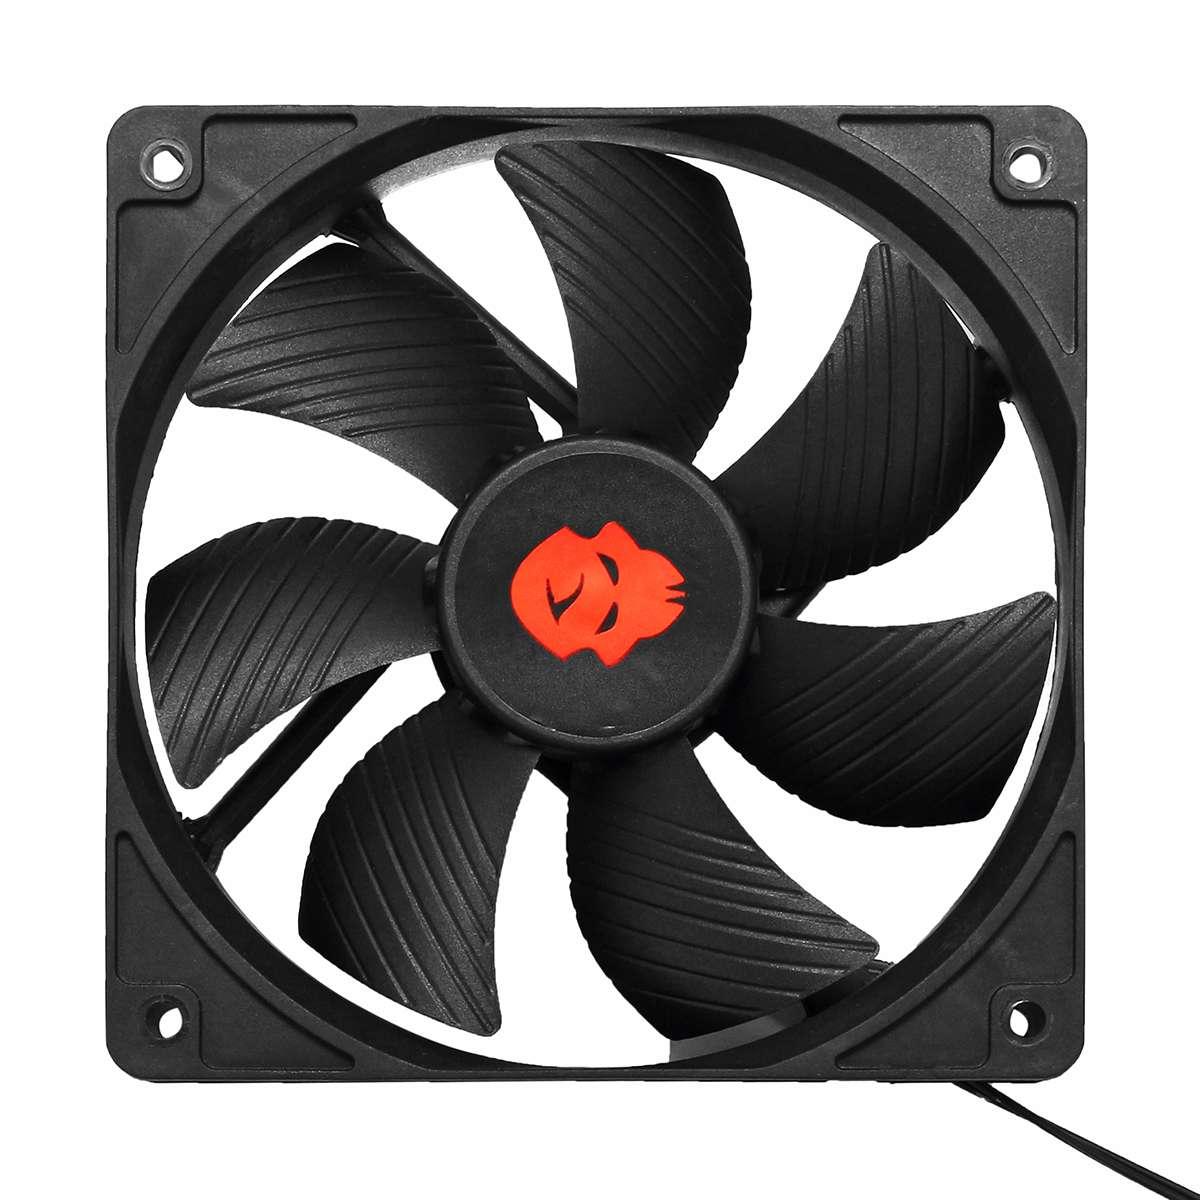 12V 4 Pin CPU PC Computer Case Fan 120mm High Speed Dual Ball Bearing Cooling Fan Heatsink Laptop Fans Accessories 3000RPM